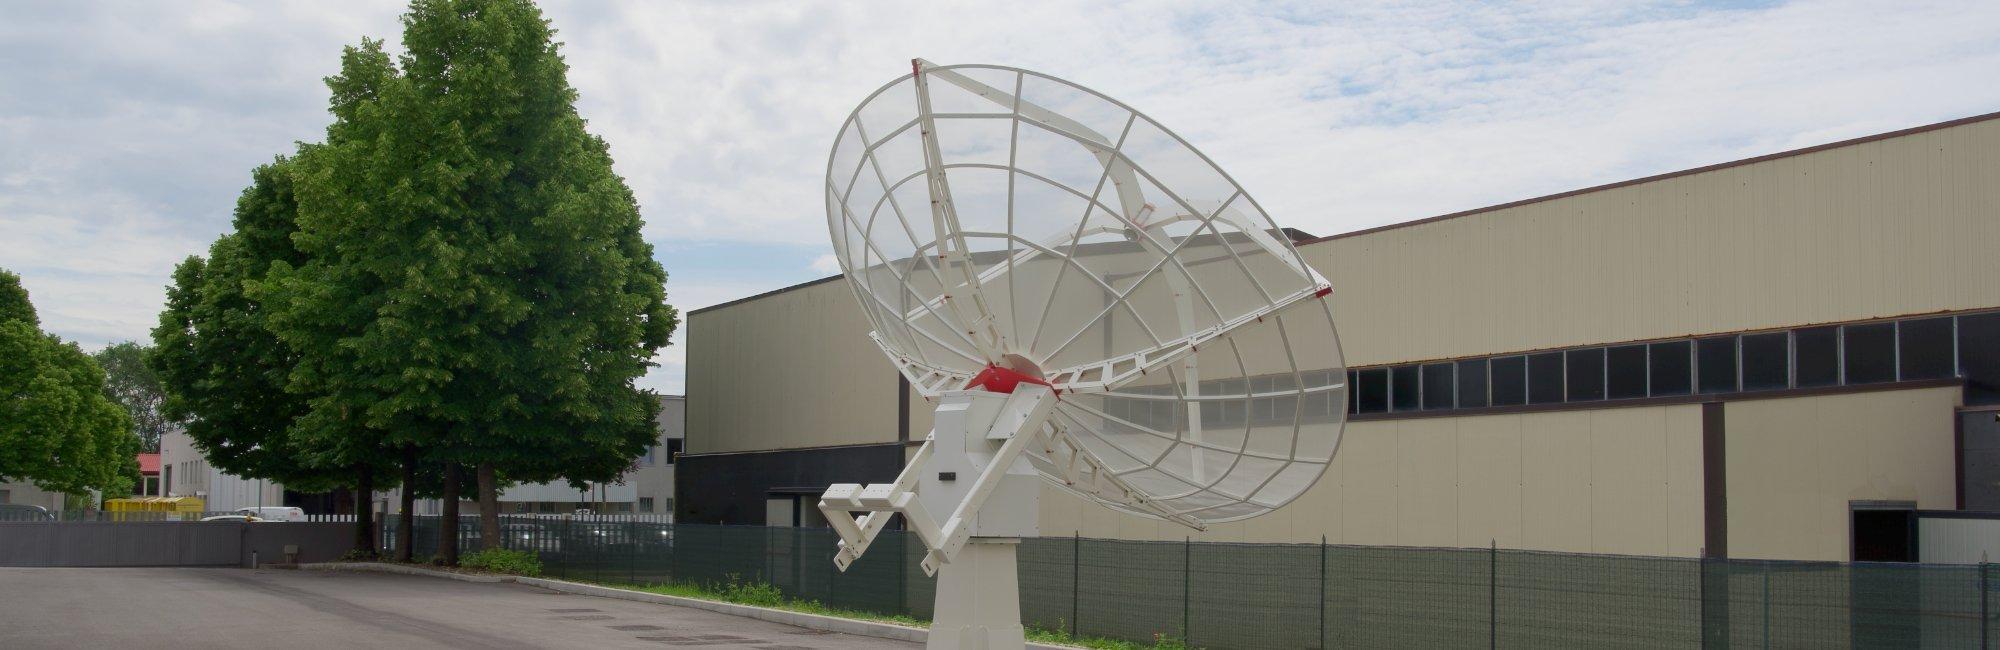 INTREPID 300S 3.0m S-band radio telescope as ground station